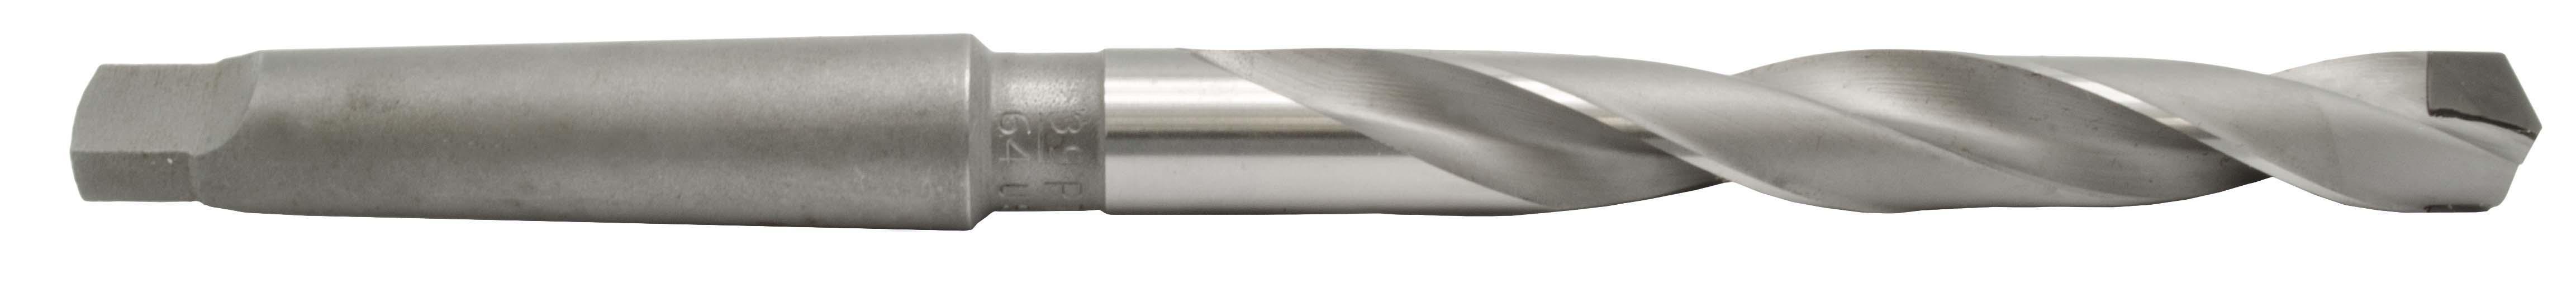 "19//32/"" .5938/"" Stub Length Drill Carbide Tipped Screw Machine"